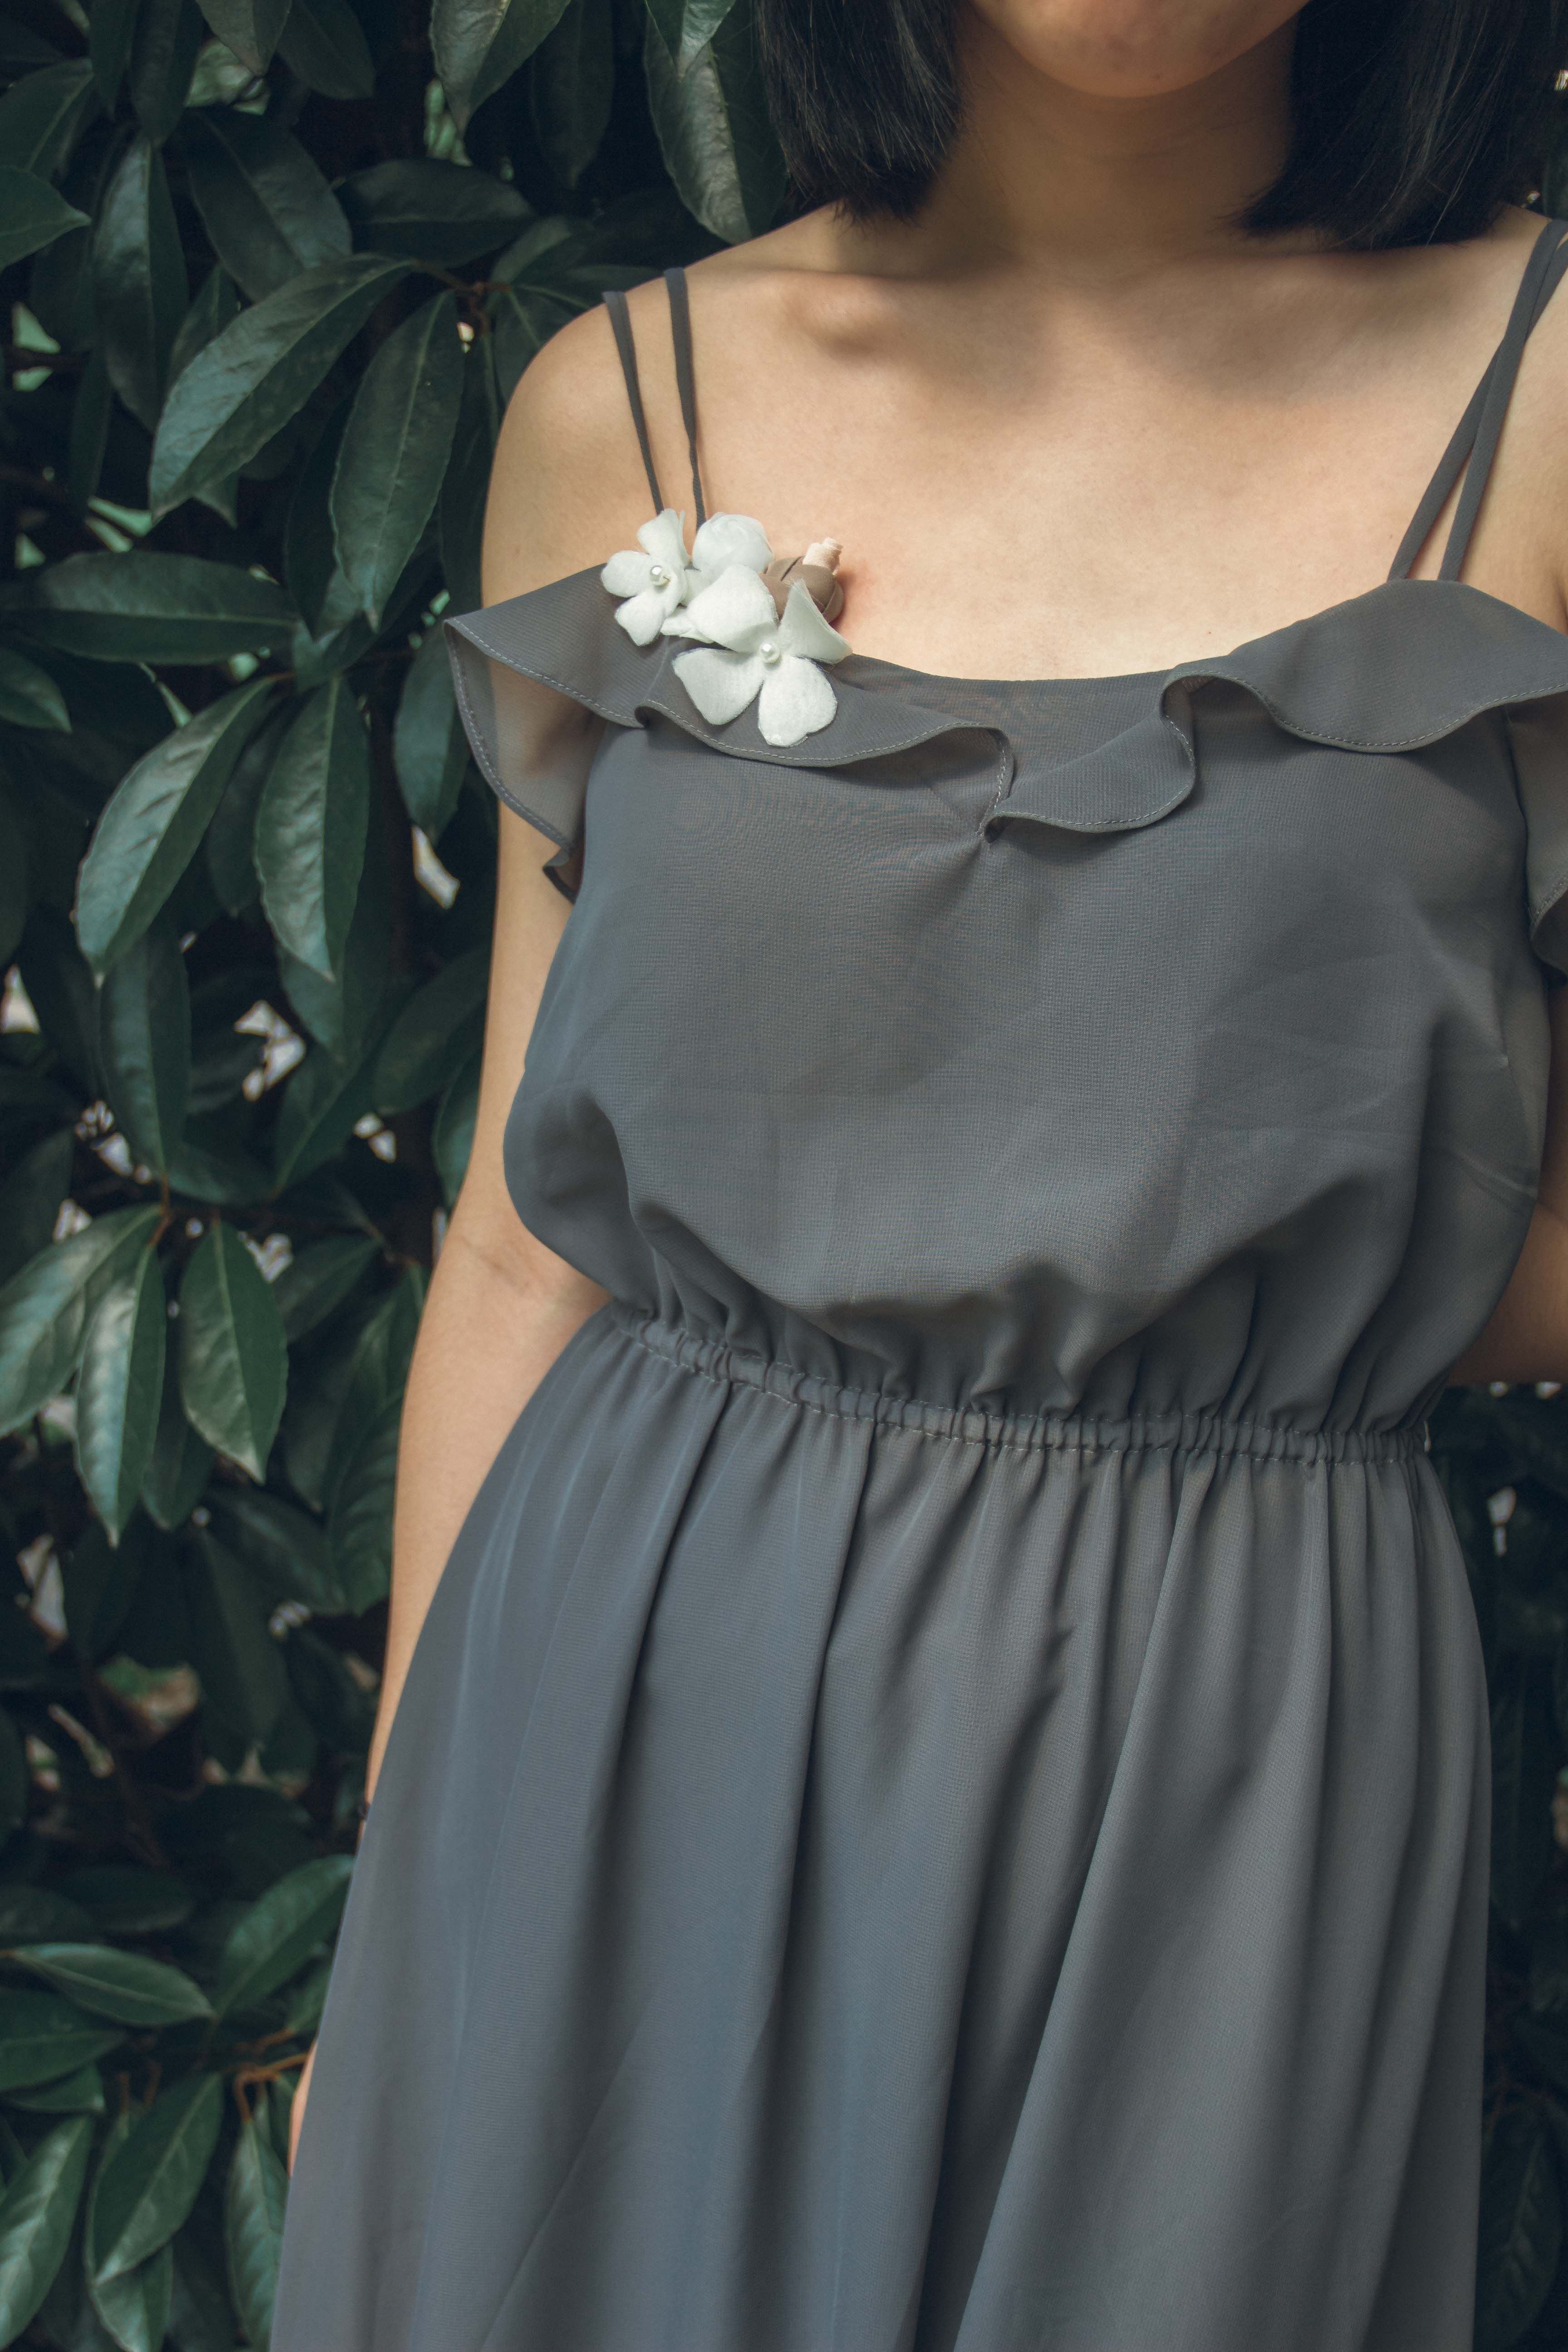 Charcoal gray bridesmaid dresslong ruffle flower wedding dress